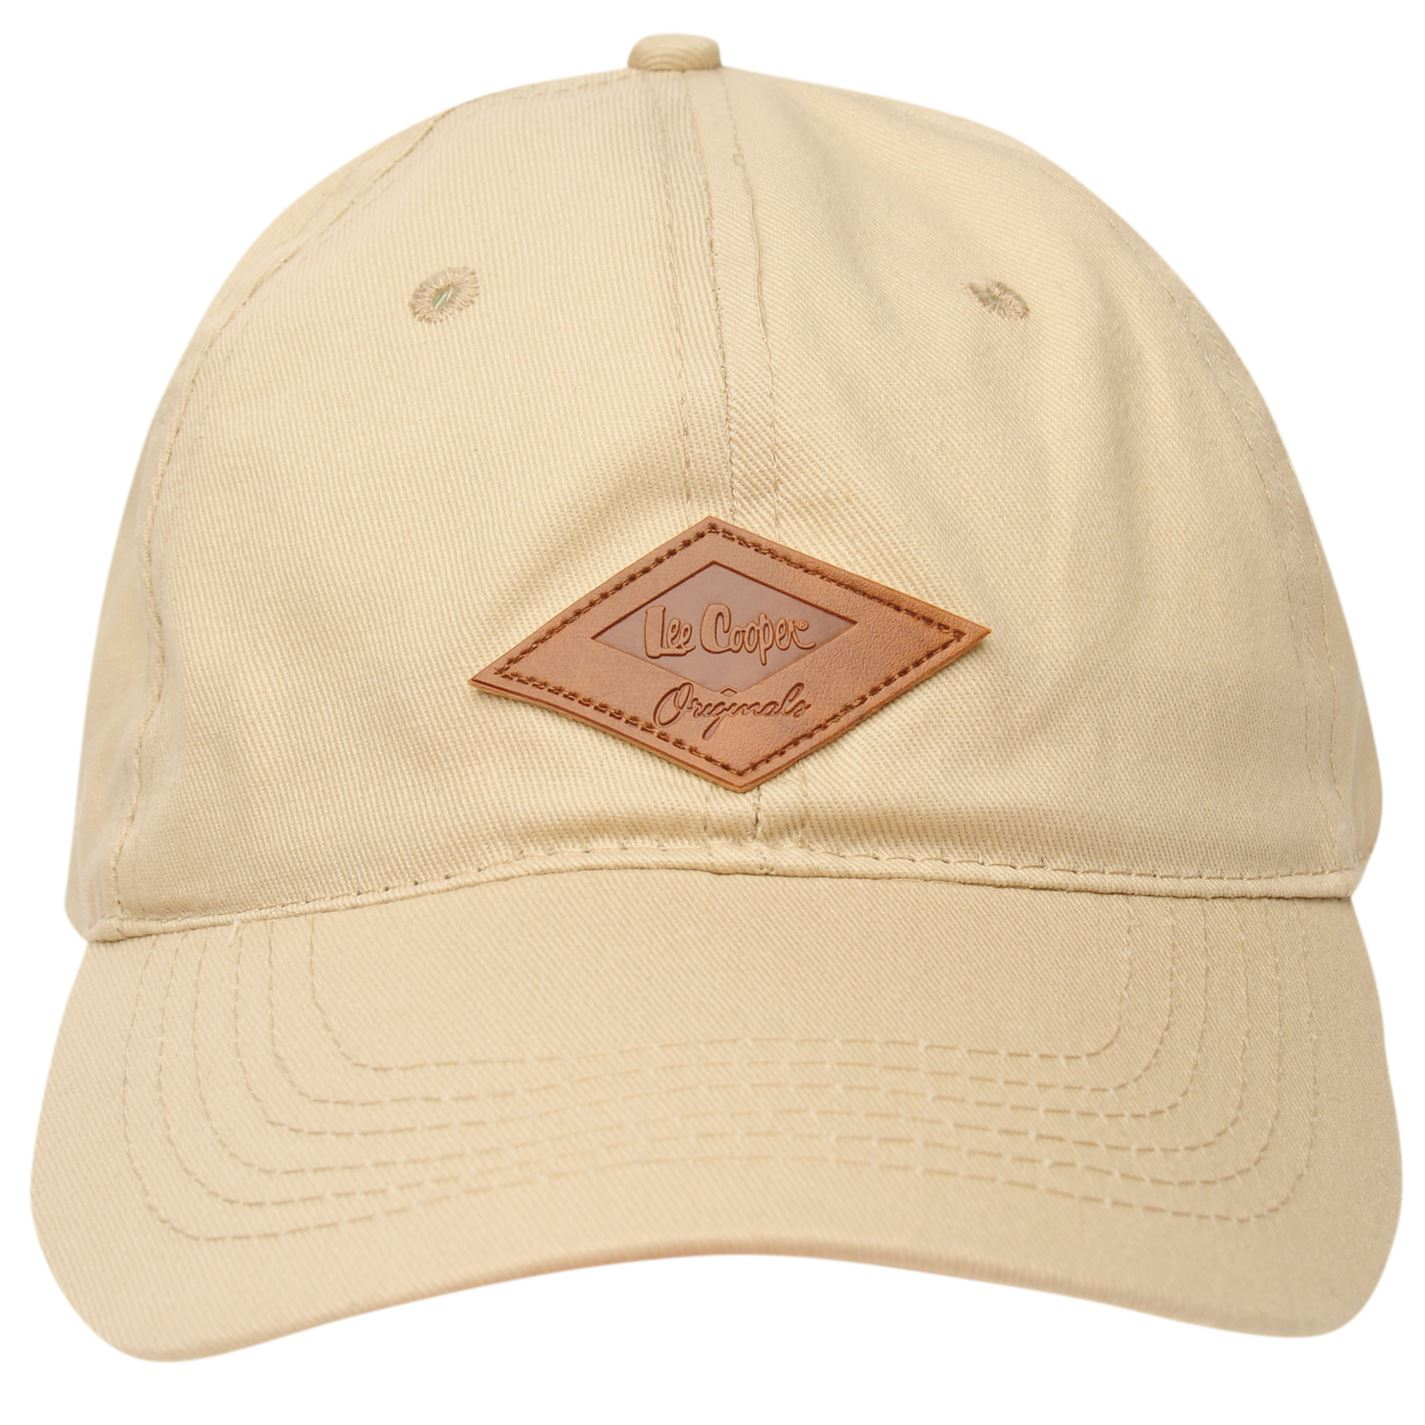 Lee Cooper Mens Originals Cap Baseball Cotton Breathability ... aef84af7687